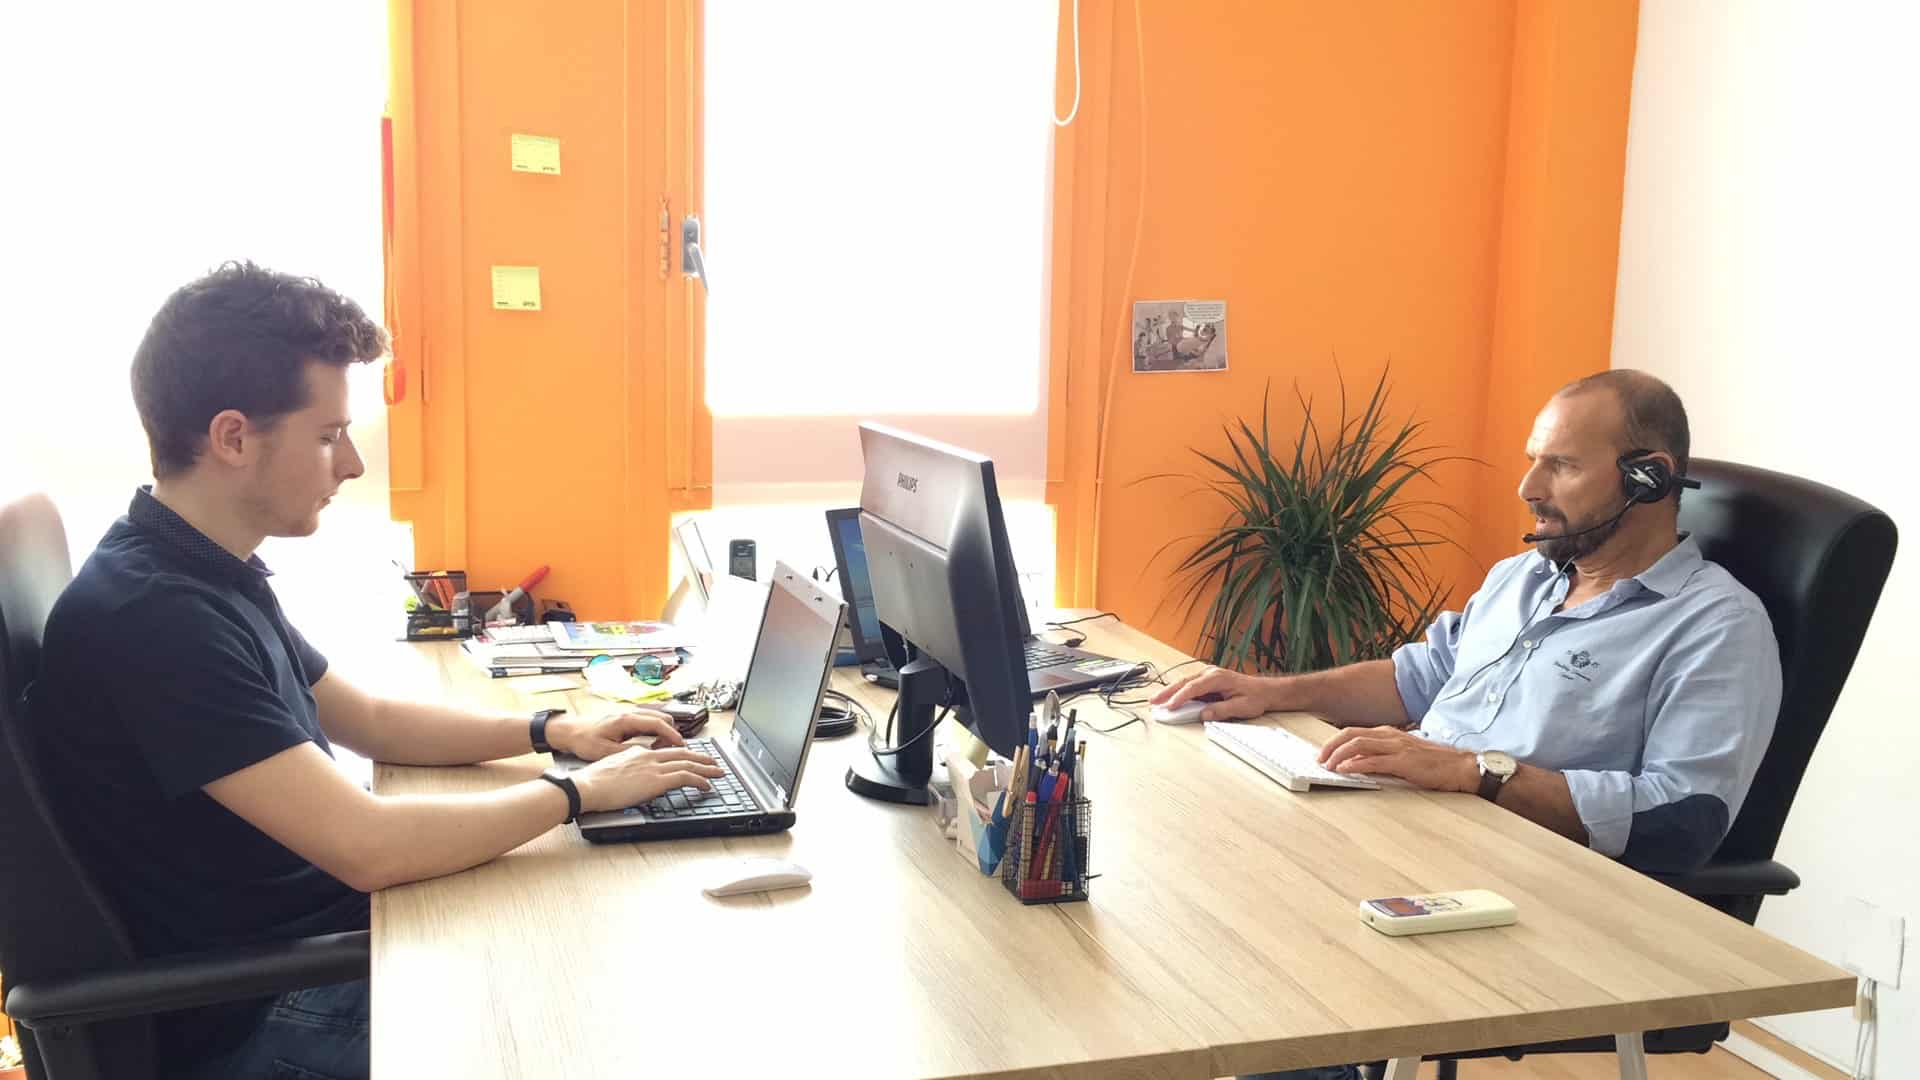 Mrktic, expertos en Mautic y Marketing Automation